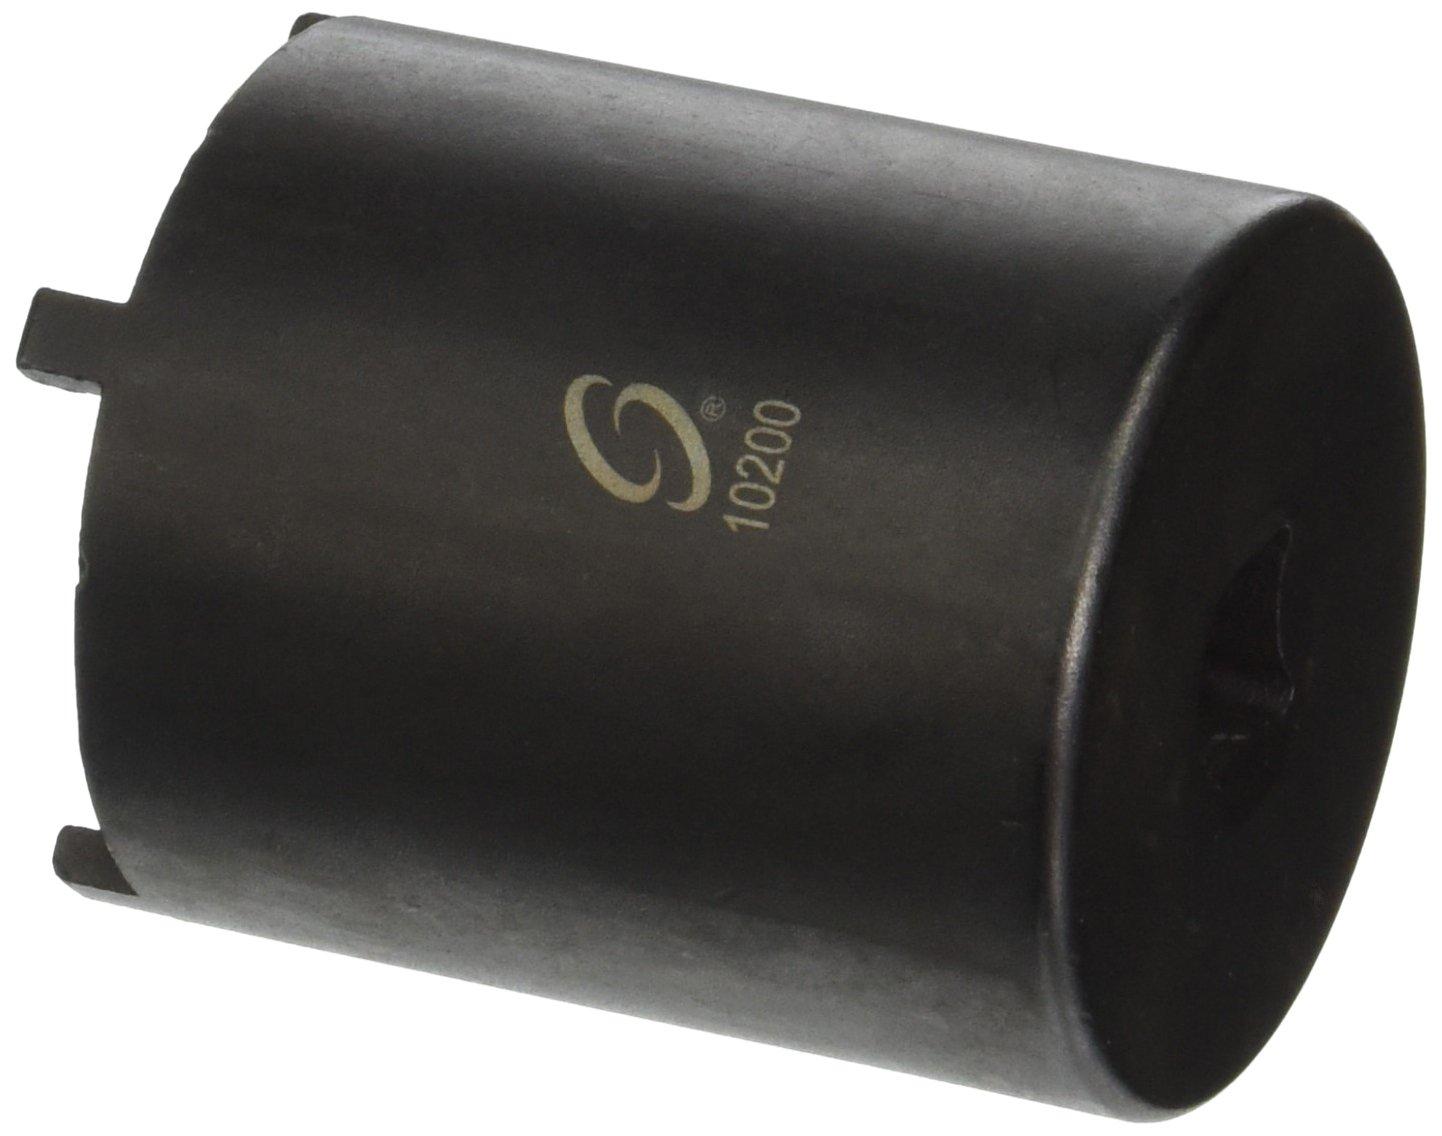 Sunex 10200 1 / 2 by 60 by 76-lnch Four Wheelドライブスピンドルナットレンチ B002GTA2YW